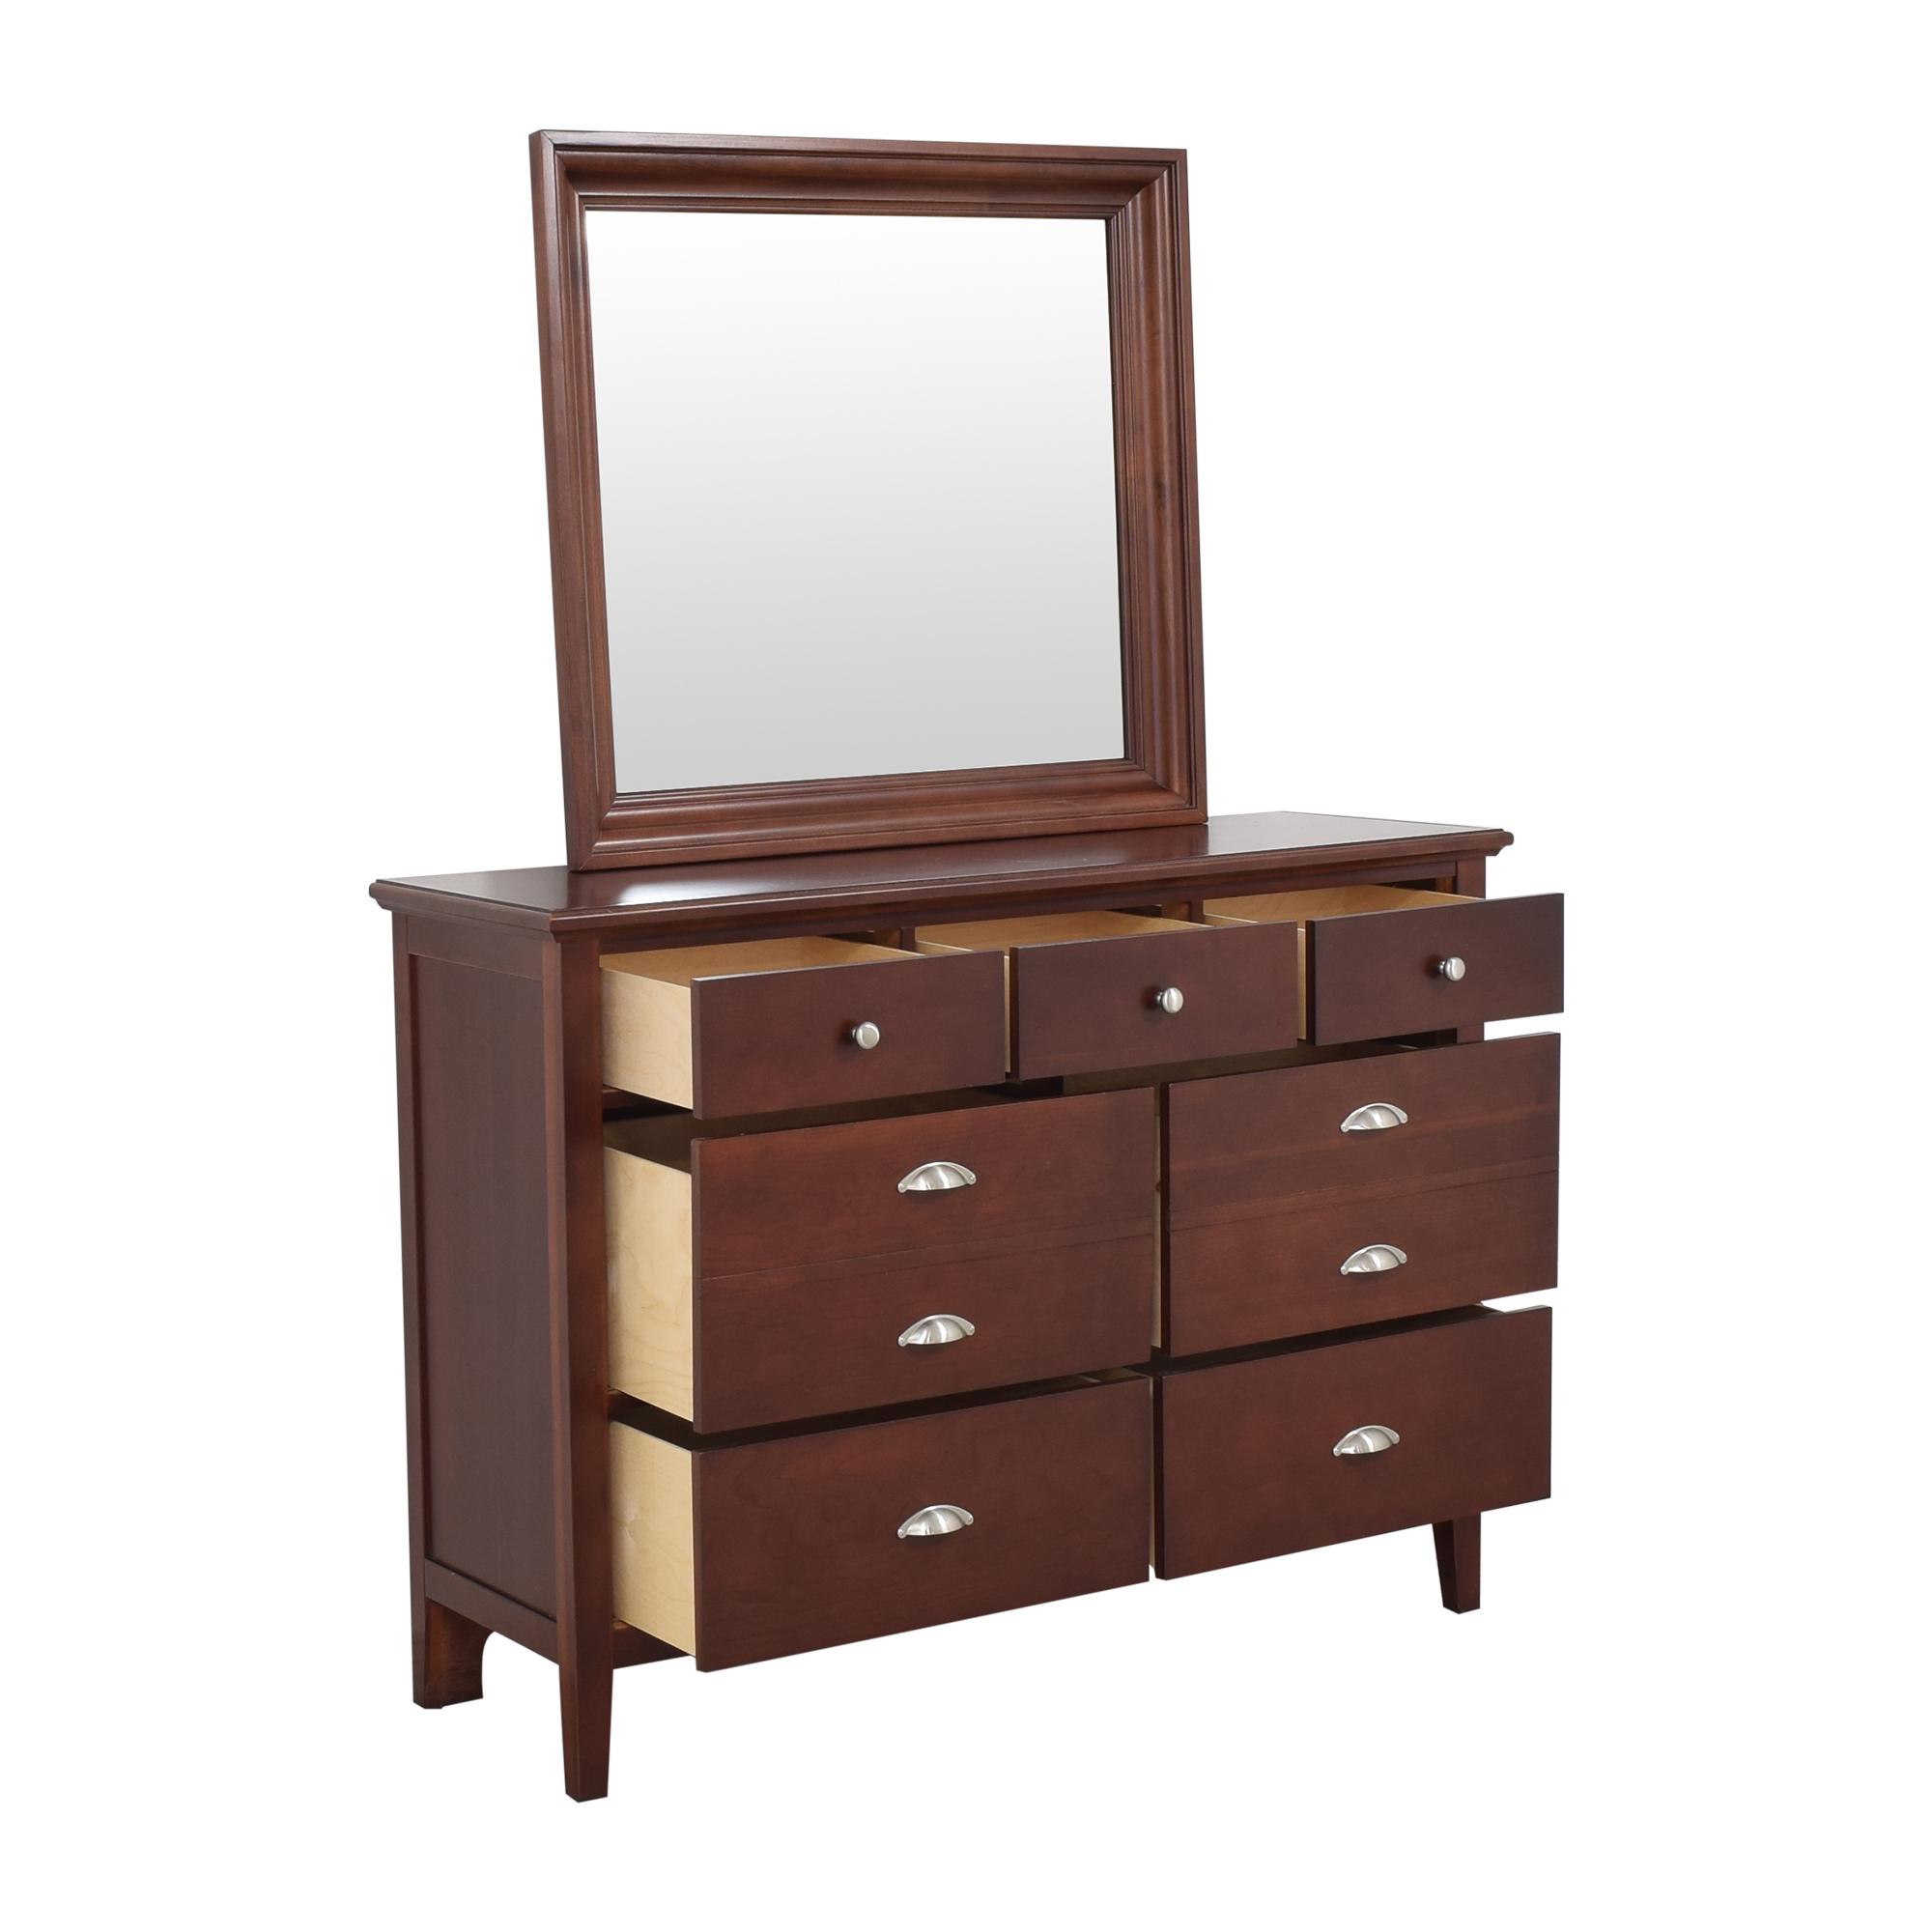 buy Vaughan-Bassett Twilight Triple Dresser with Mirror Vaughan-Bassett